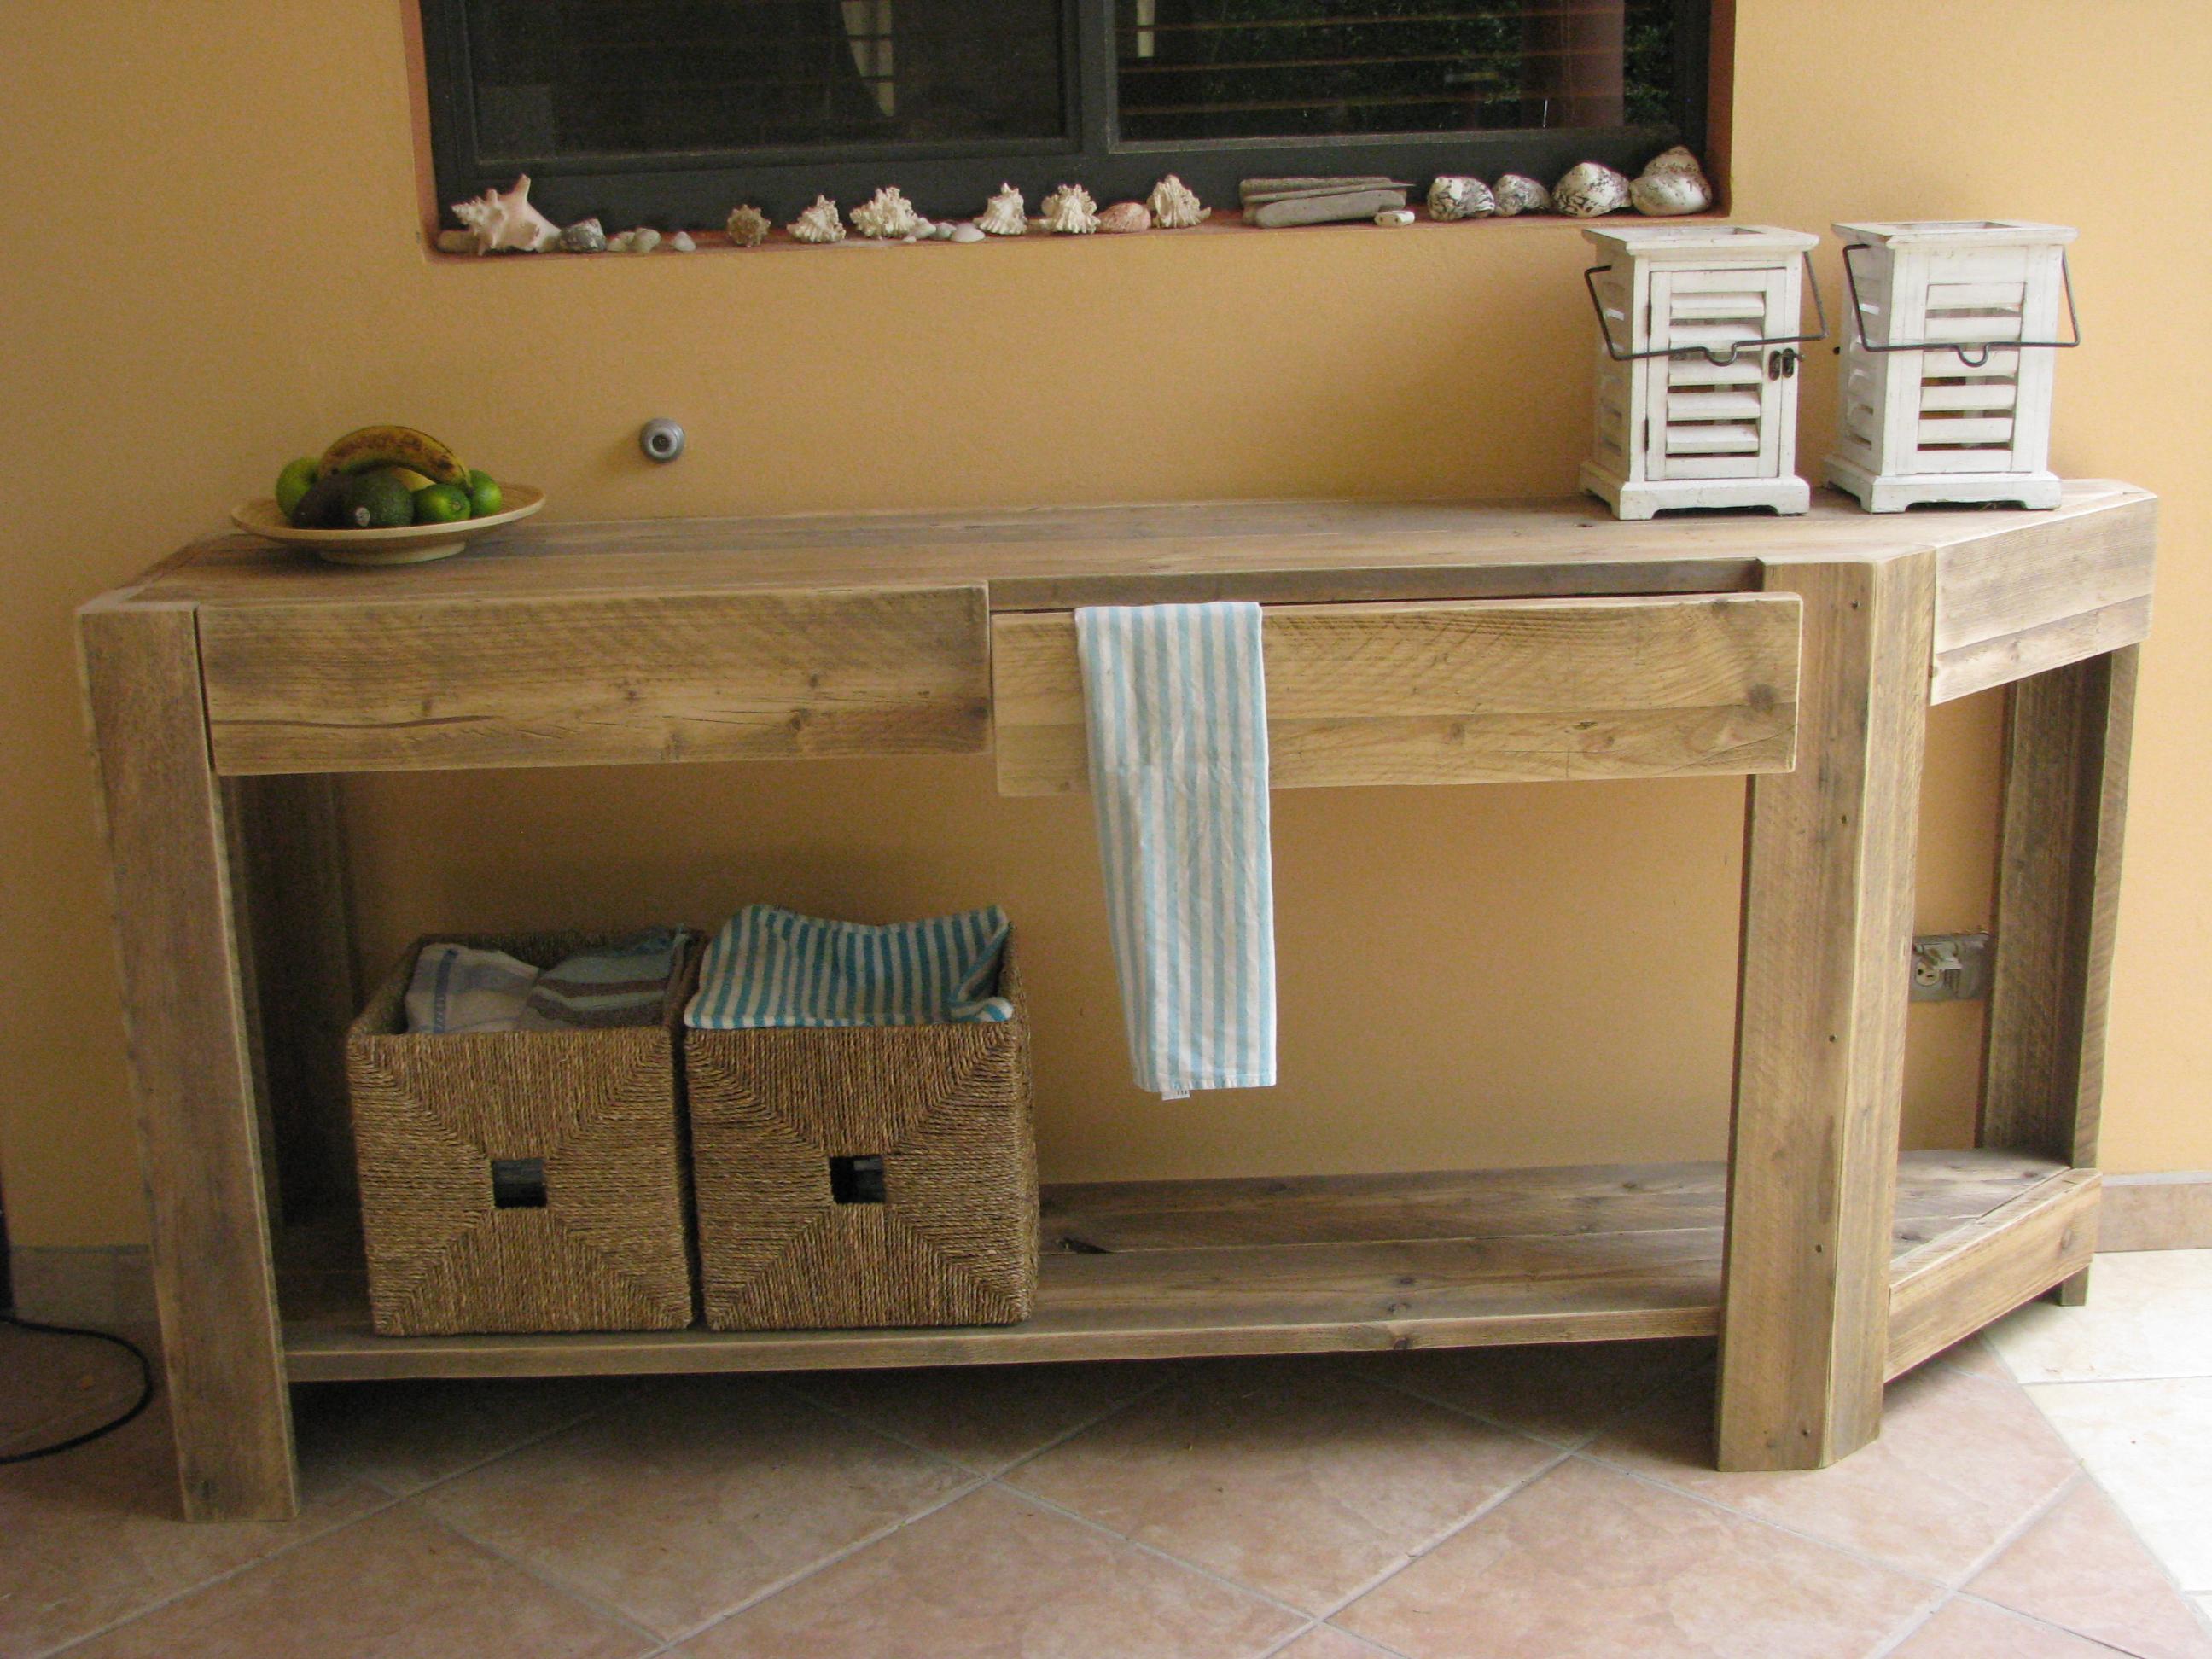 Side Table Keuken.Keuken Side Table Op Maat Met 2 Lades B45 X L200x H93 Plank